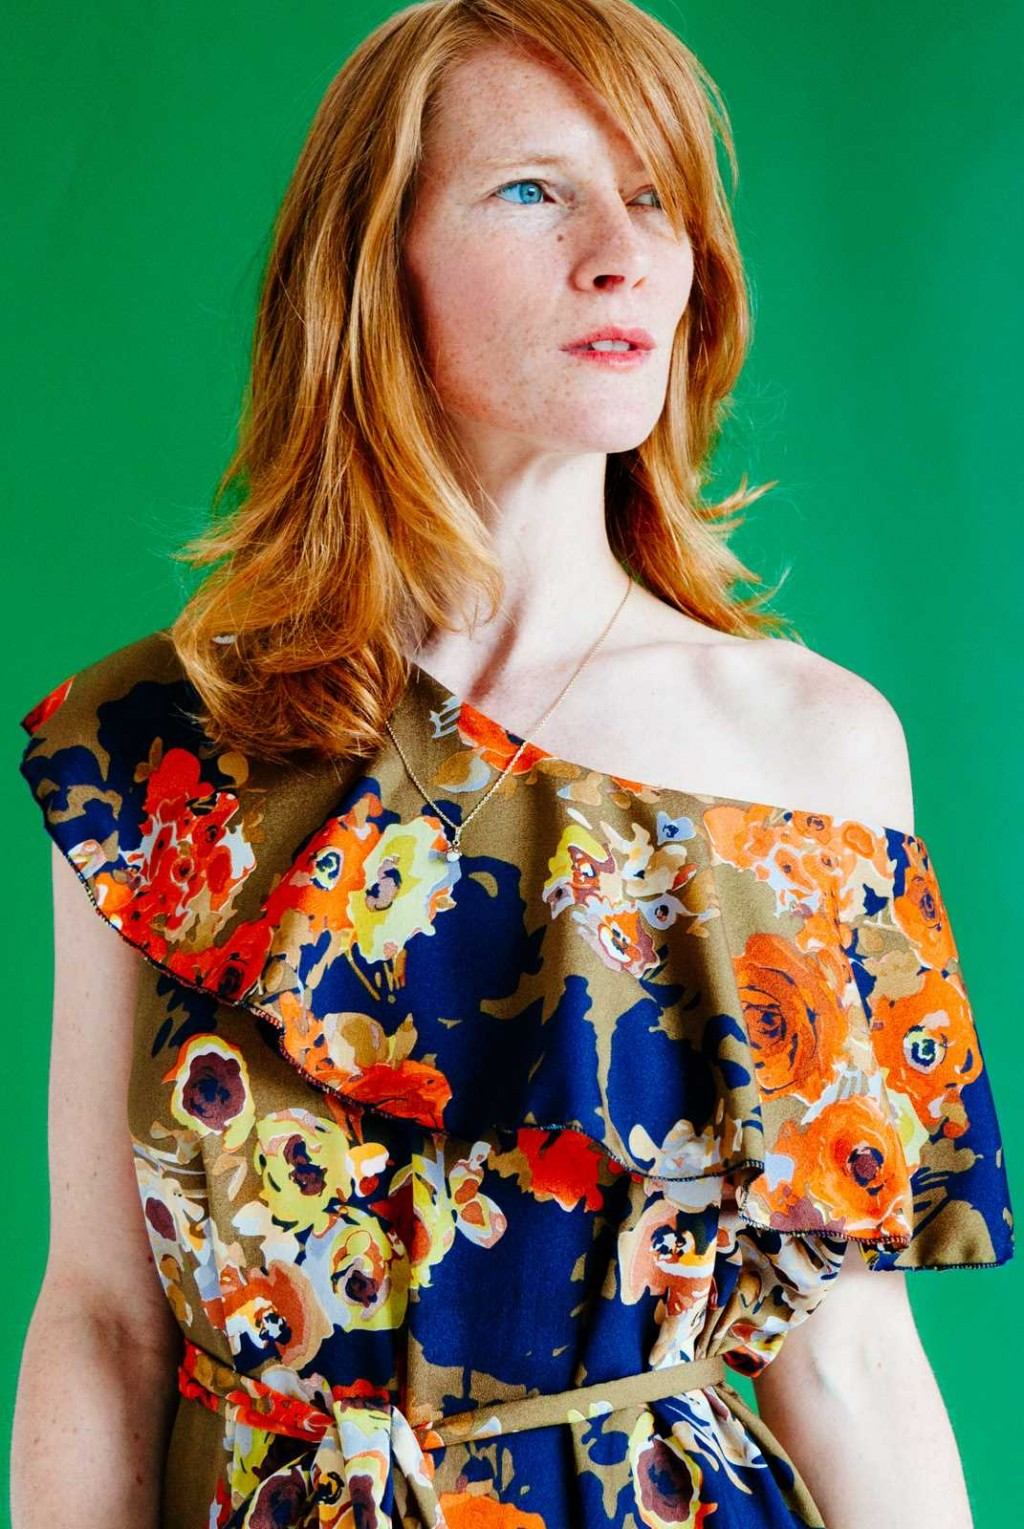 Fashion Portraits by Beto Ruiz Alonso